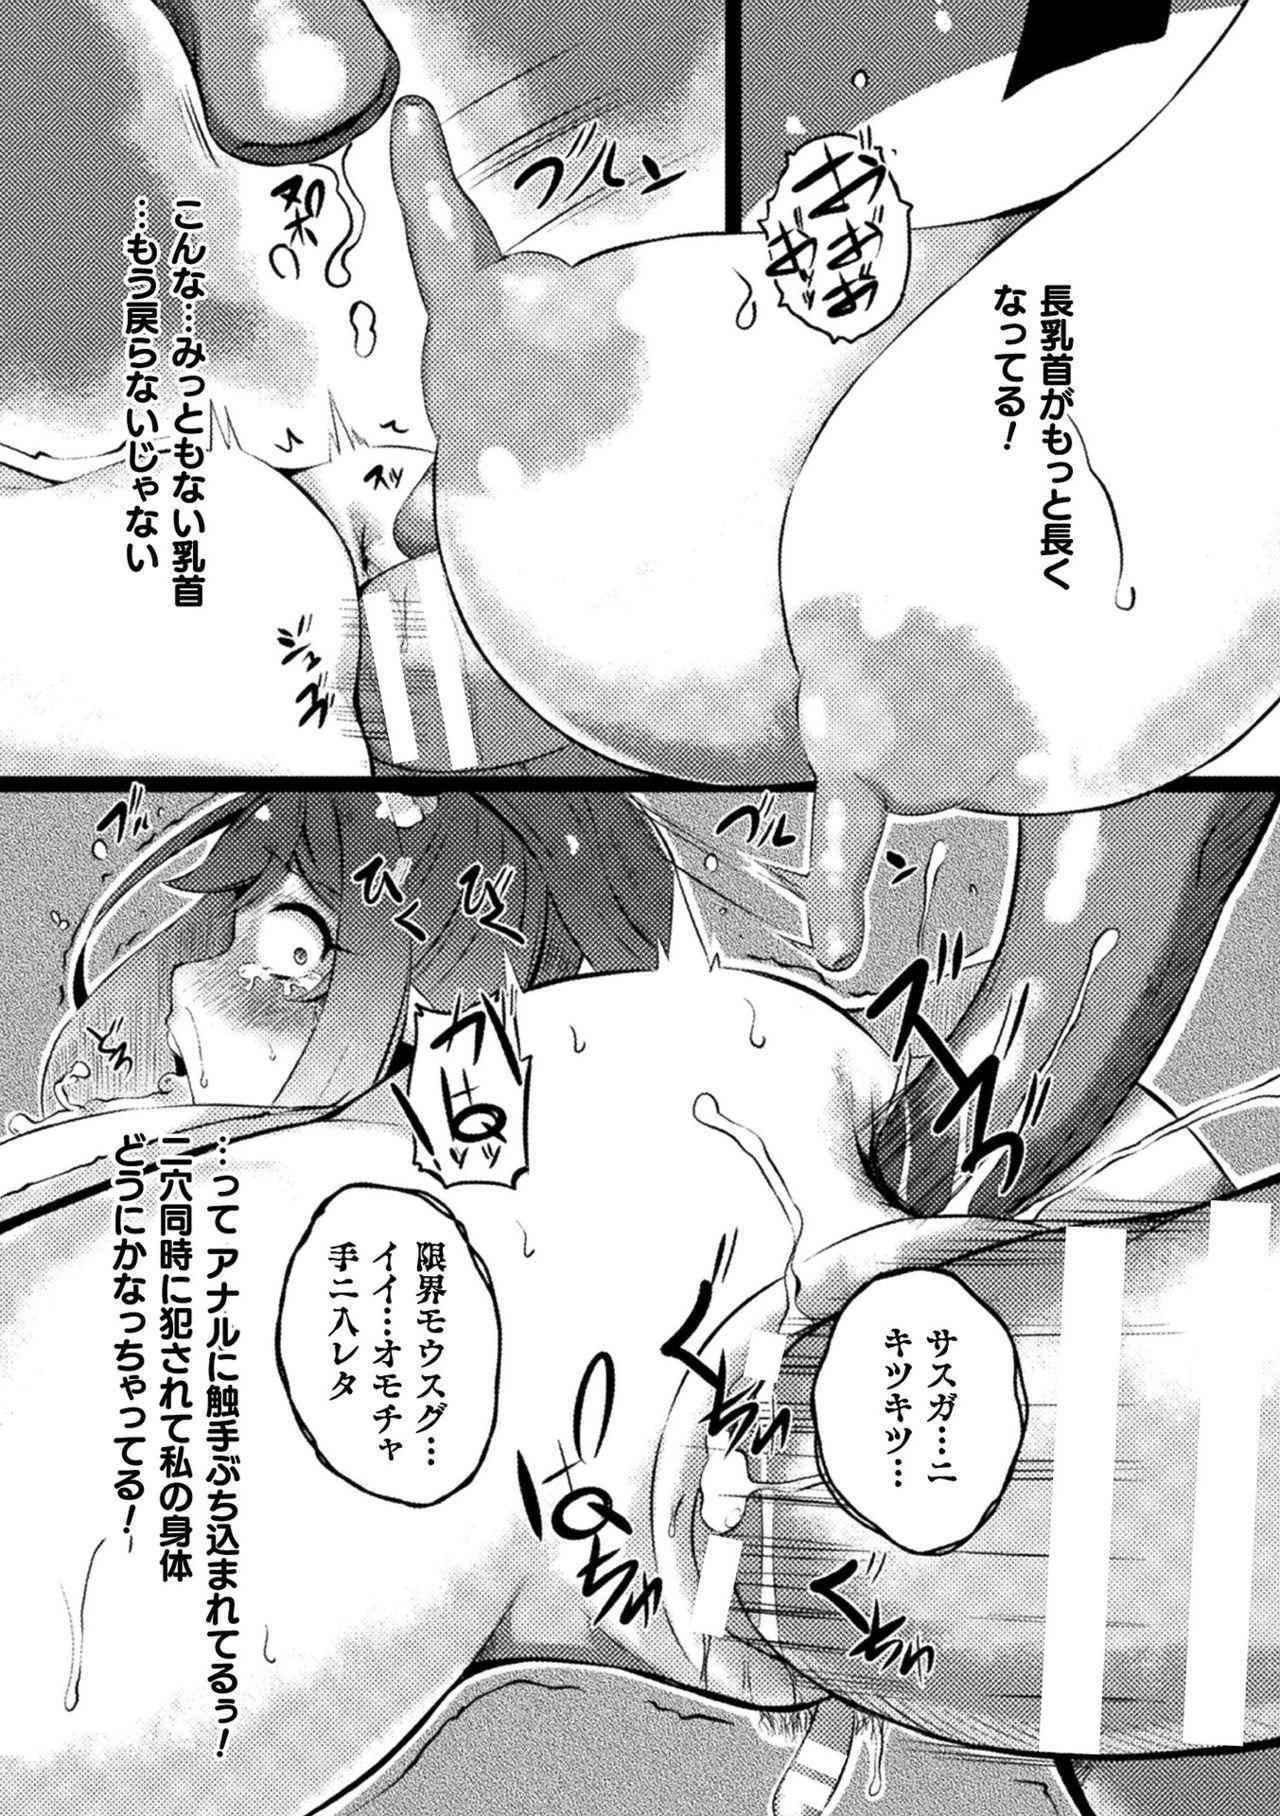 2D Comic Magazine - Syukusyouka Hiroin Kyousei Onahole Keikaku Vol. 2 53